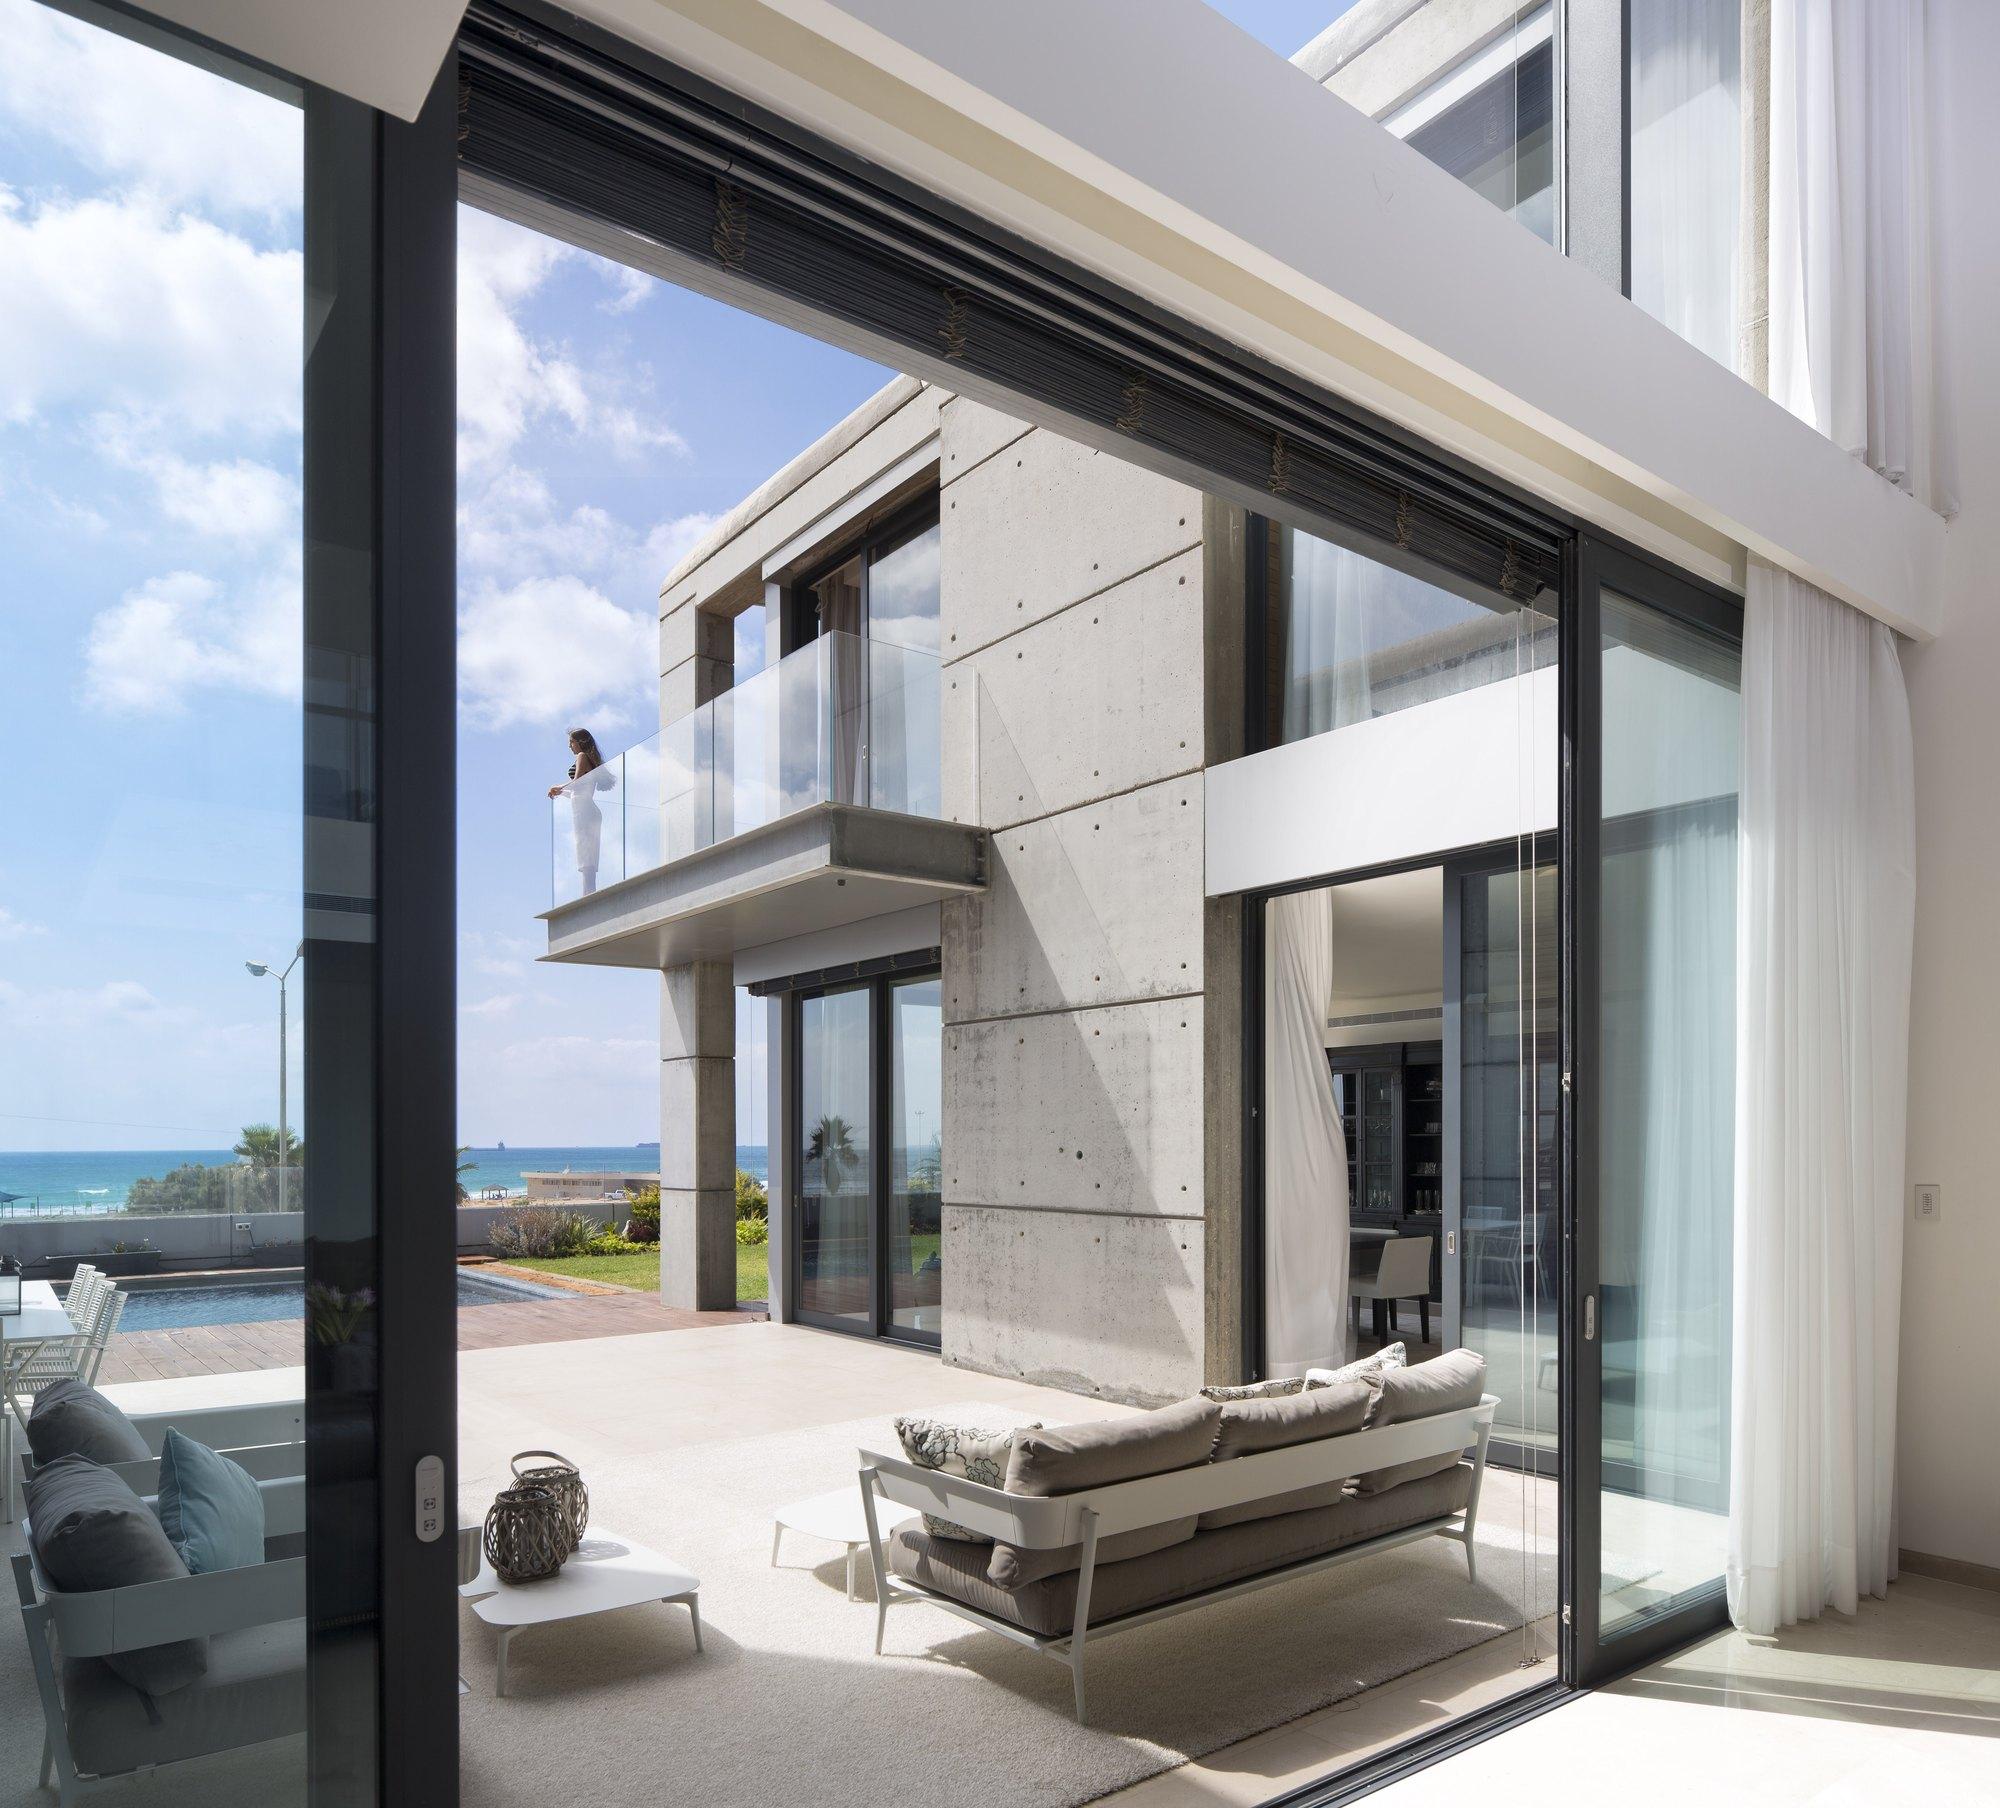 Casa frente al mar / Nava Yavetz Architects